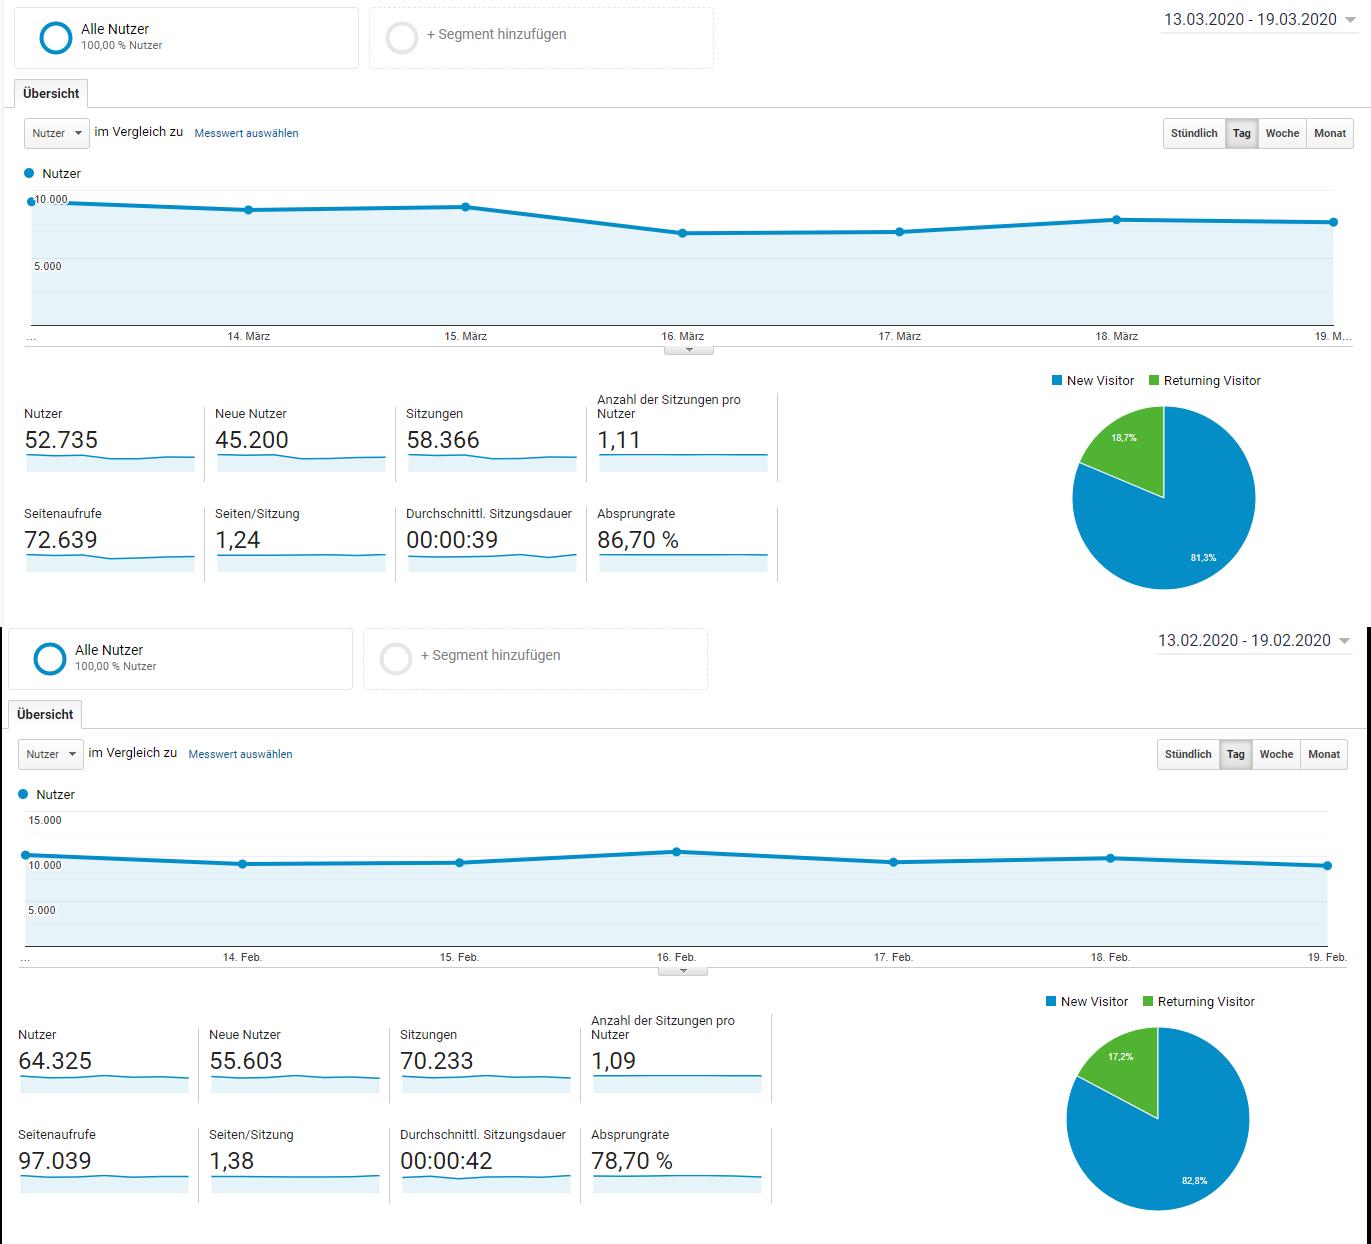 screenshot-analytics.google.com-2020.03.20-12_33_17.png